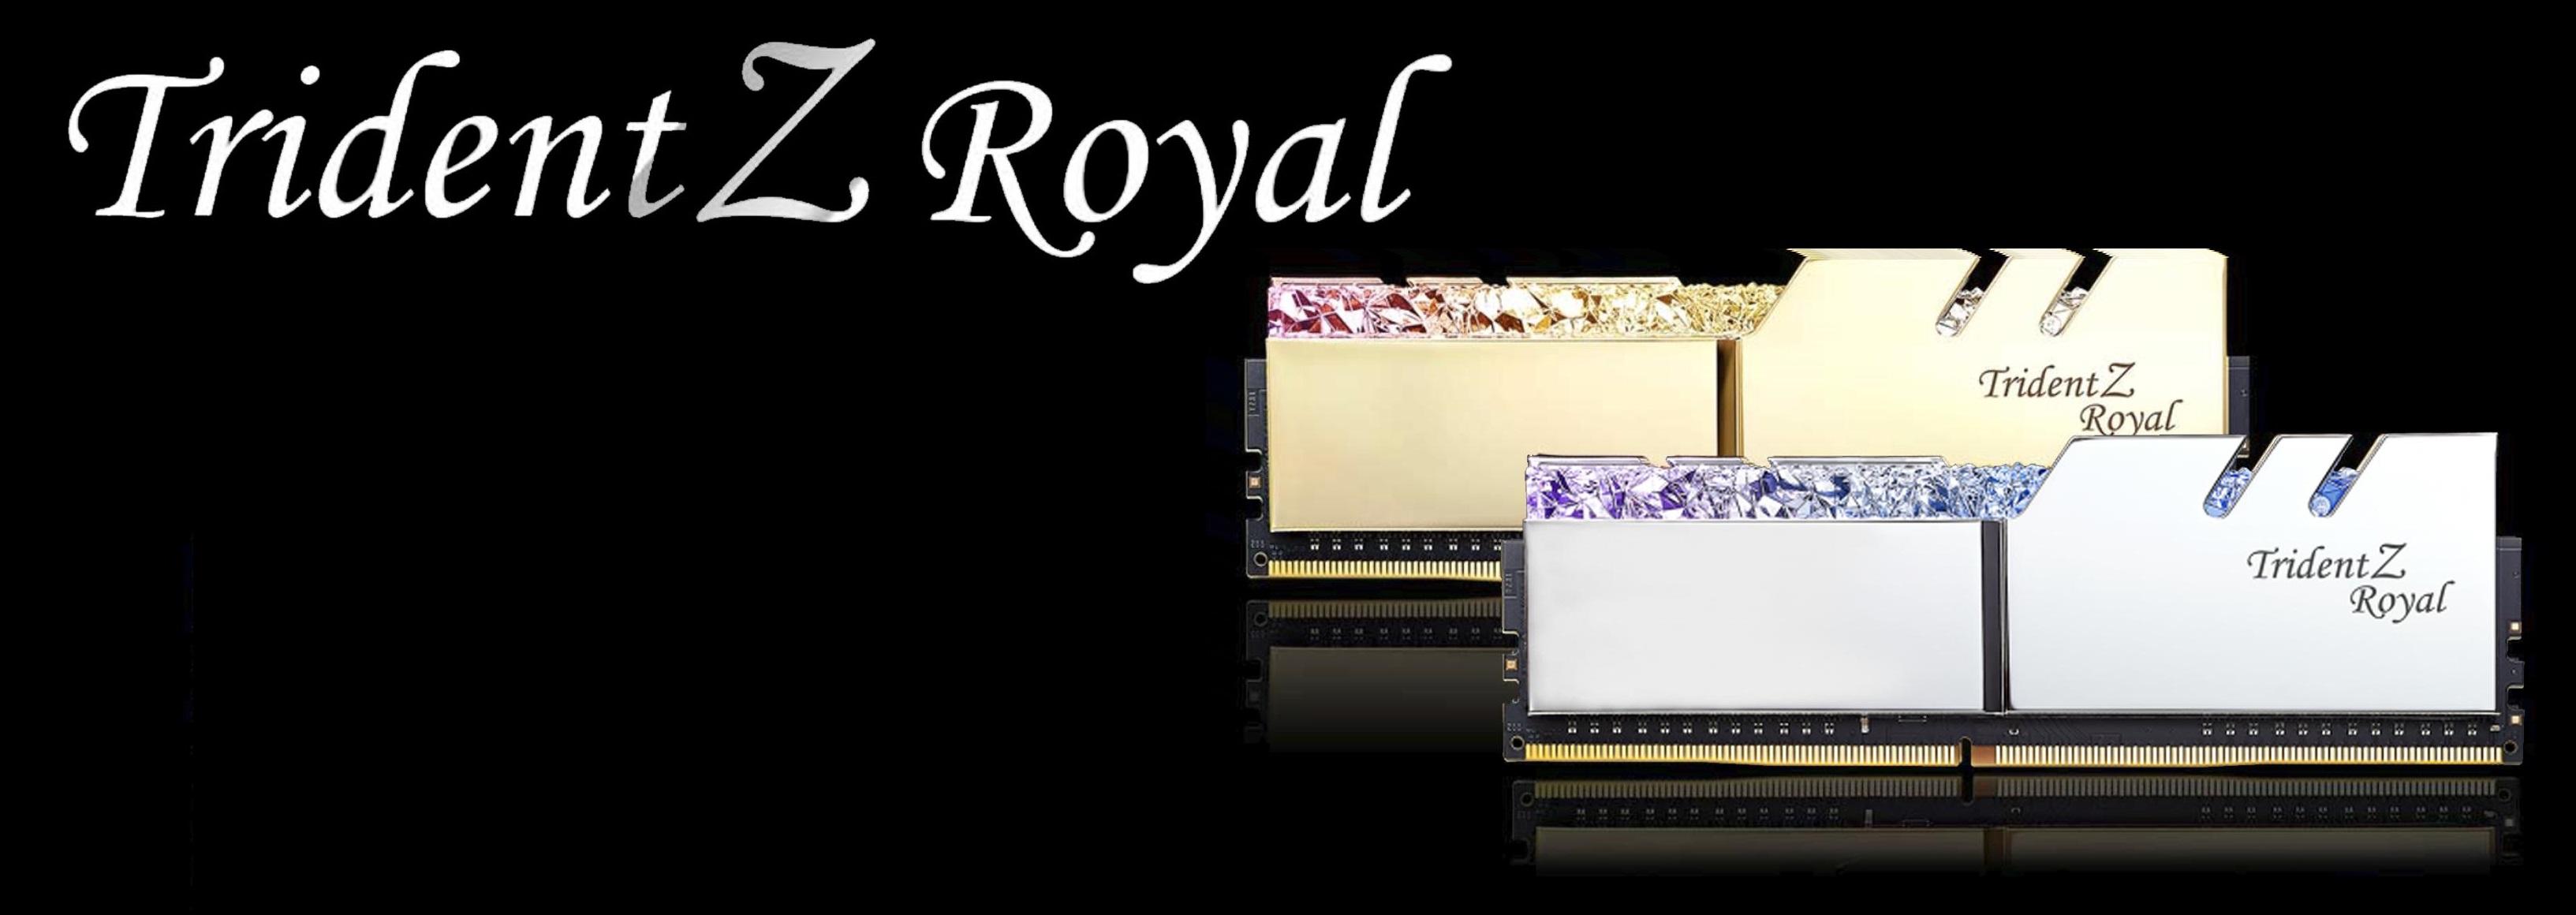 Trident Z Royal Ddr4 Banner2